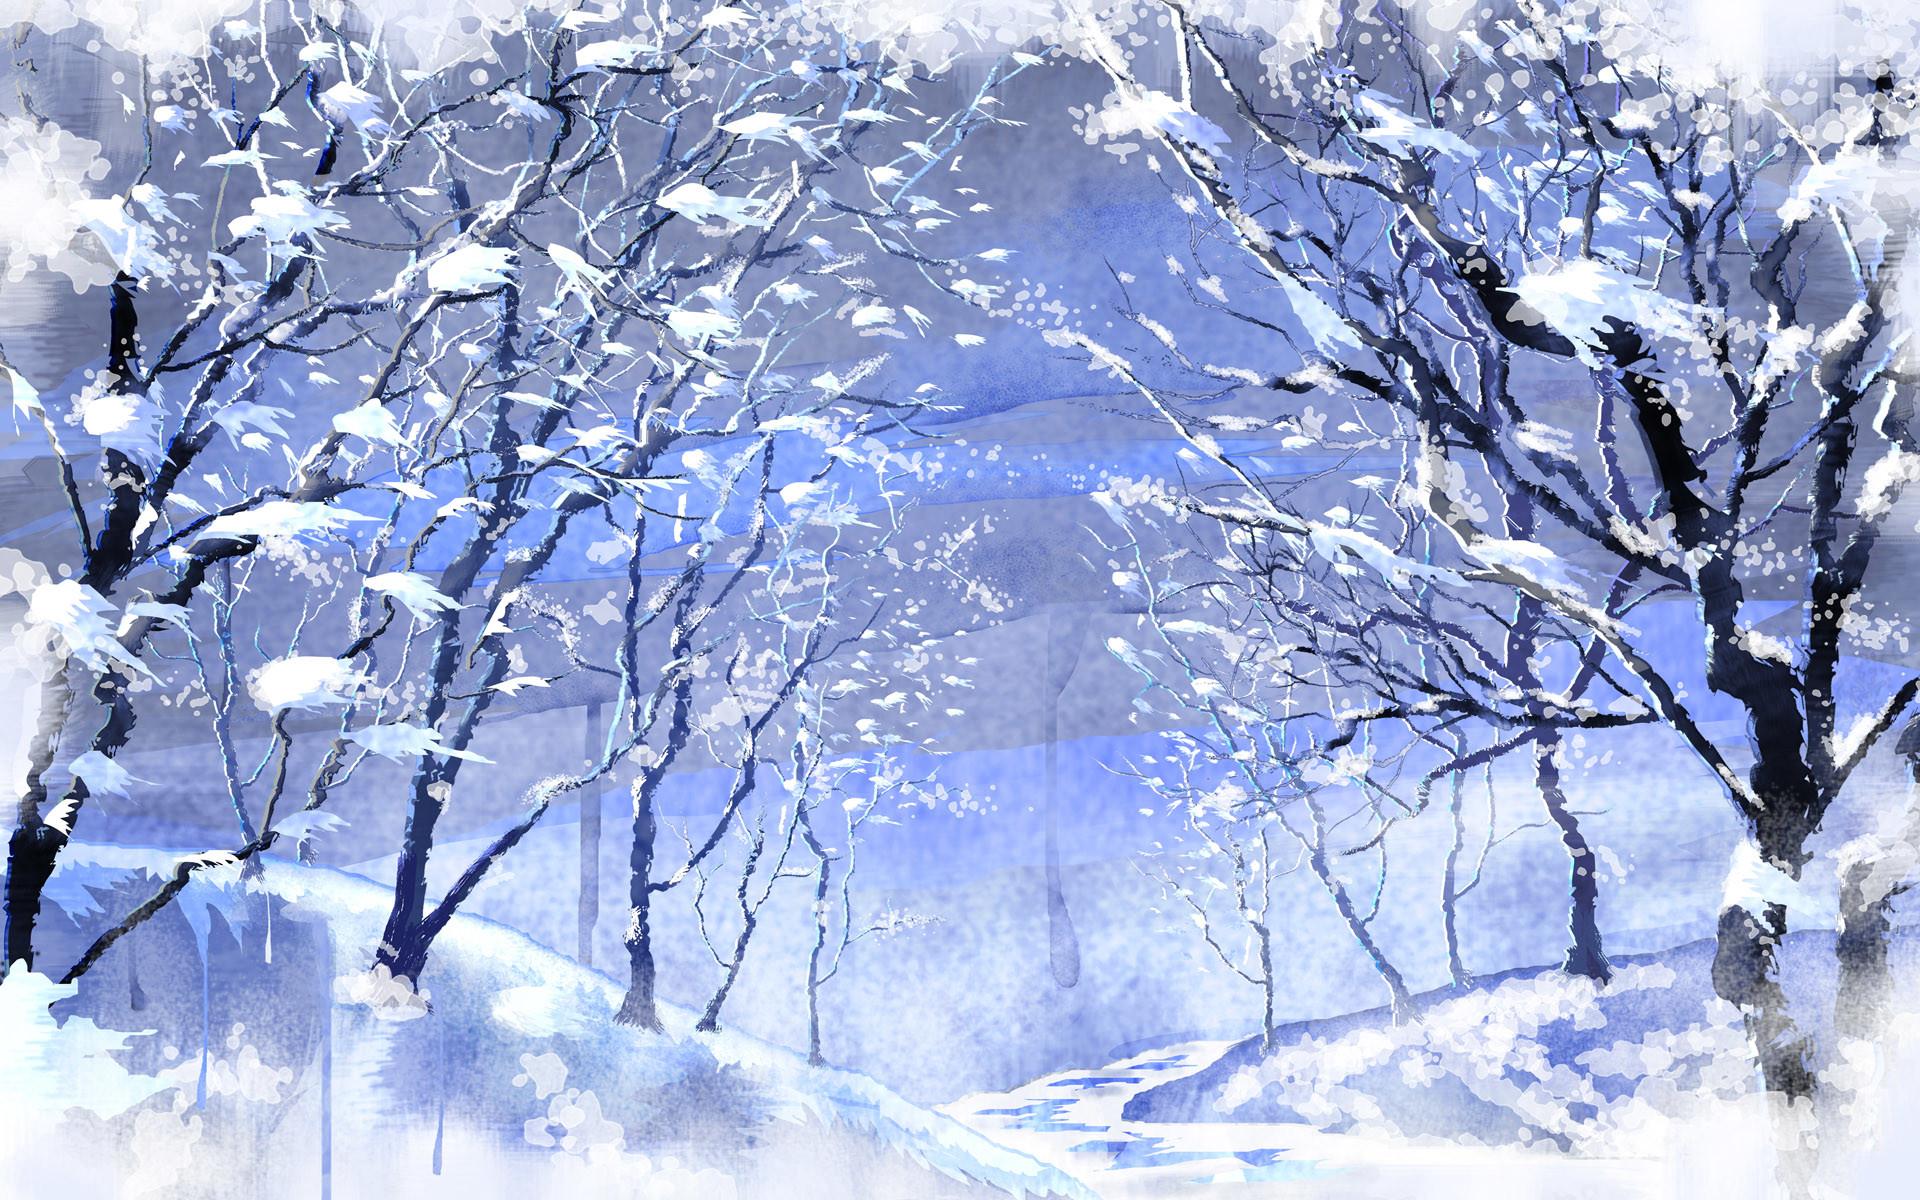 Winter Scene Wallpaper, Free Winter Scene Wallpaper, Christmas Scenery .